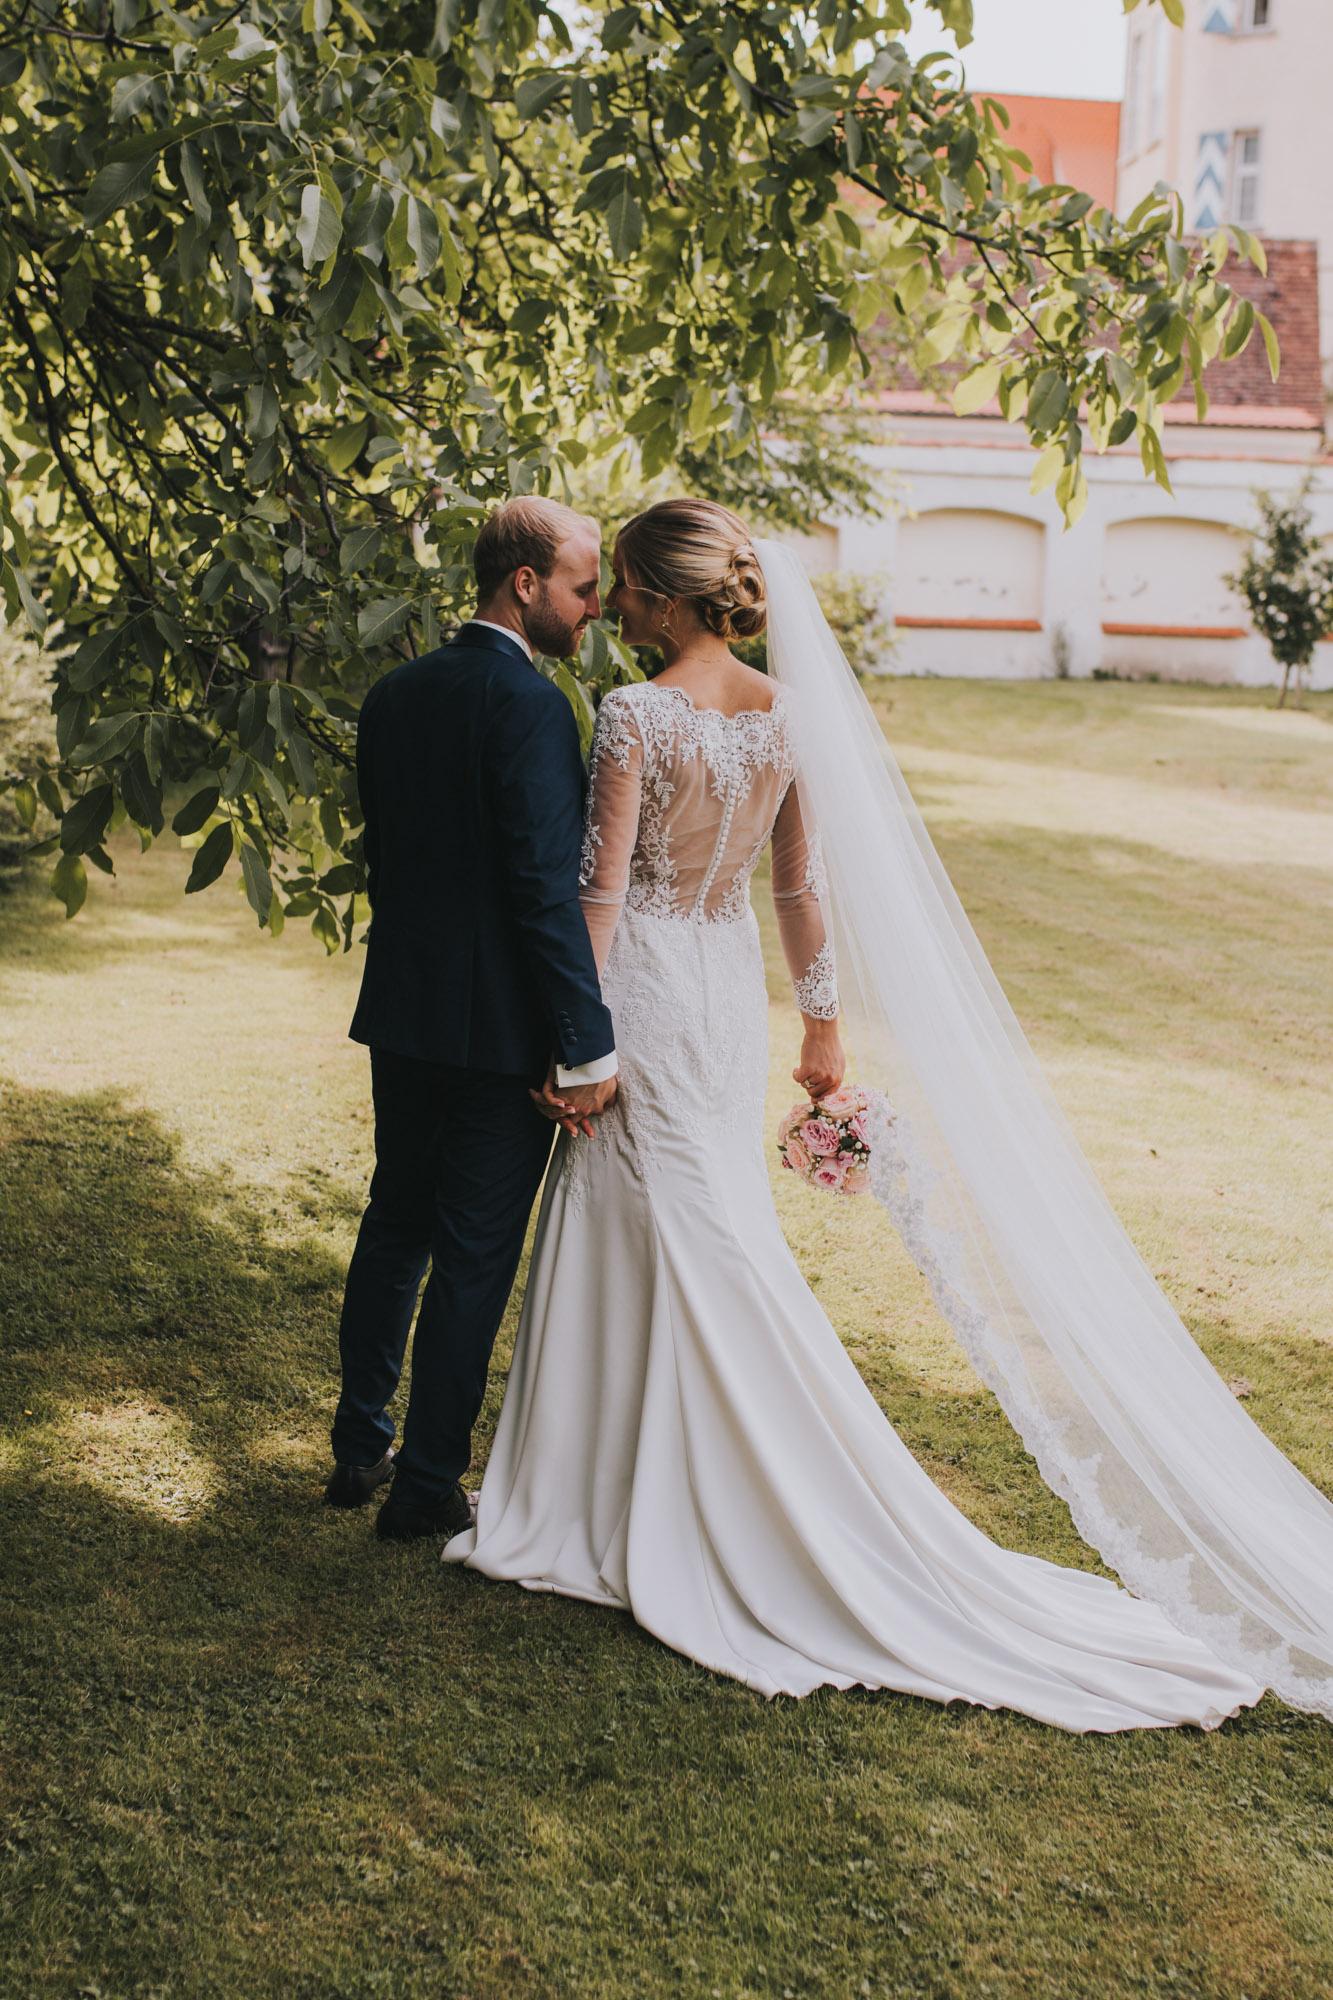 Hochzeit - Memory factory - 20180616-0050.jpg